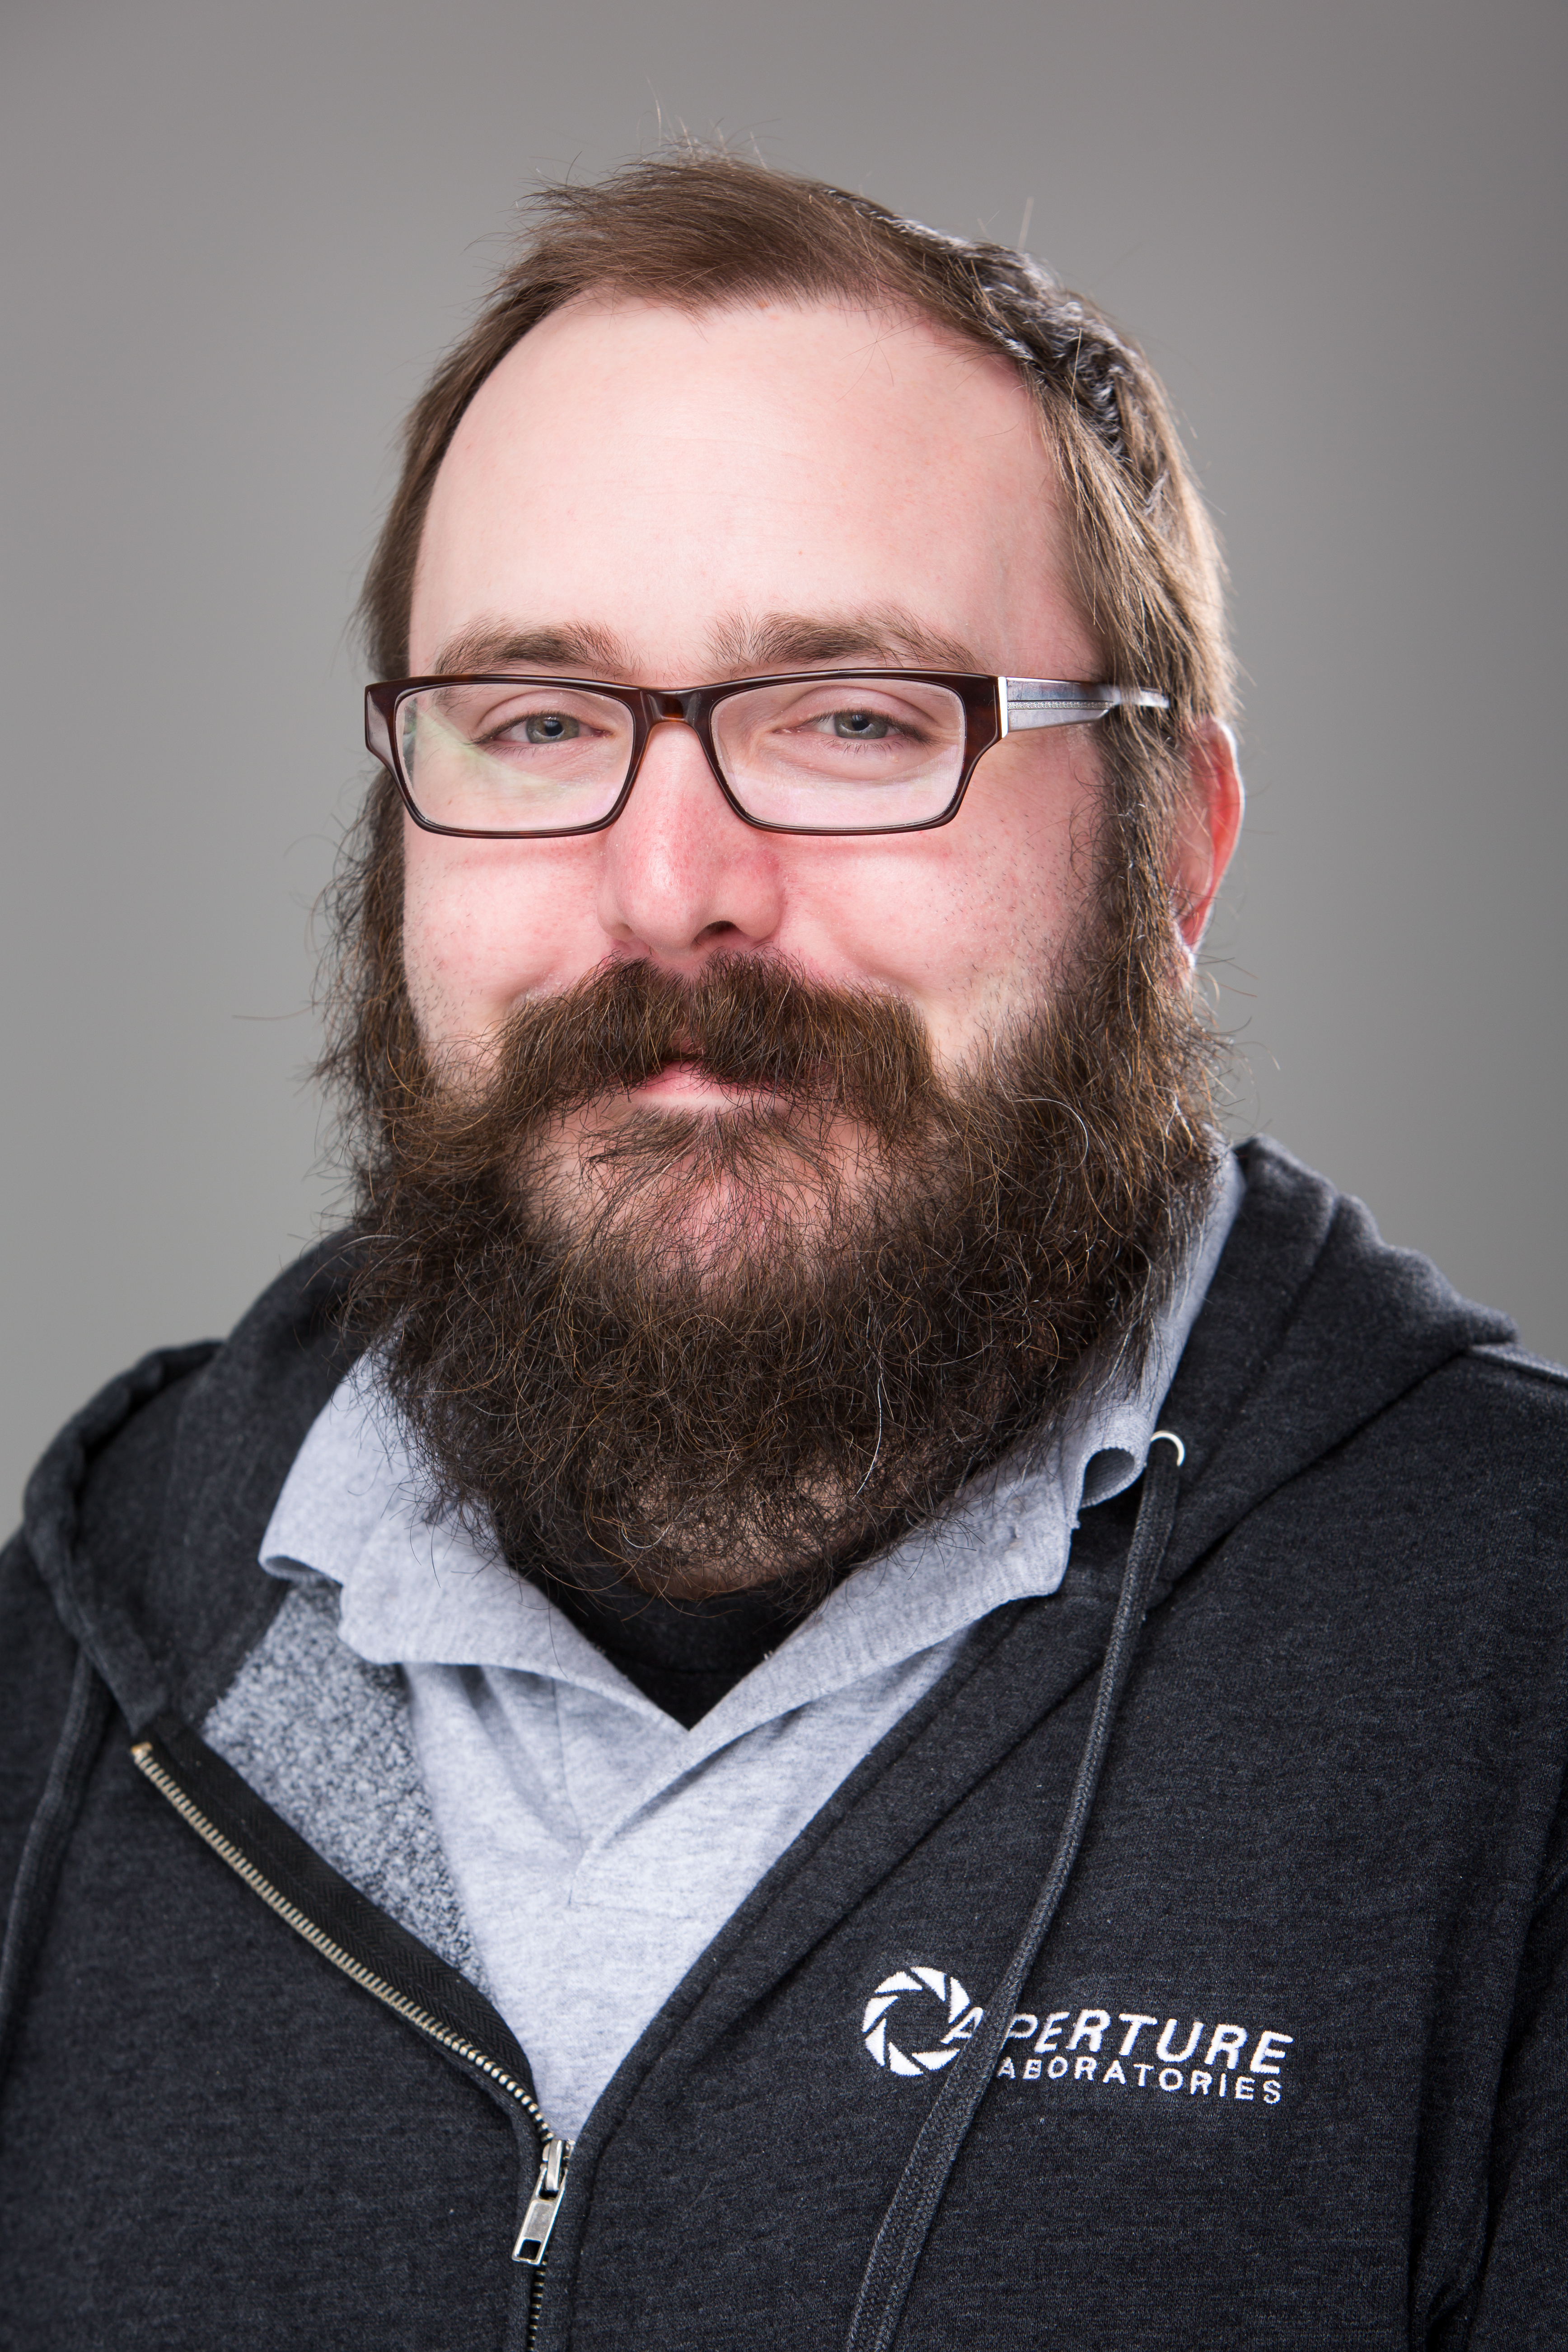 Aaron Guthland-Strubert